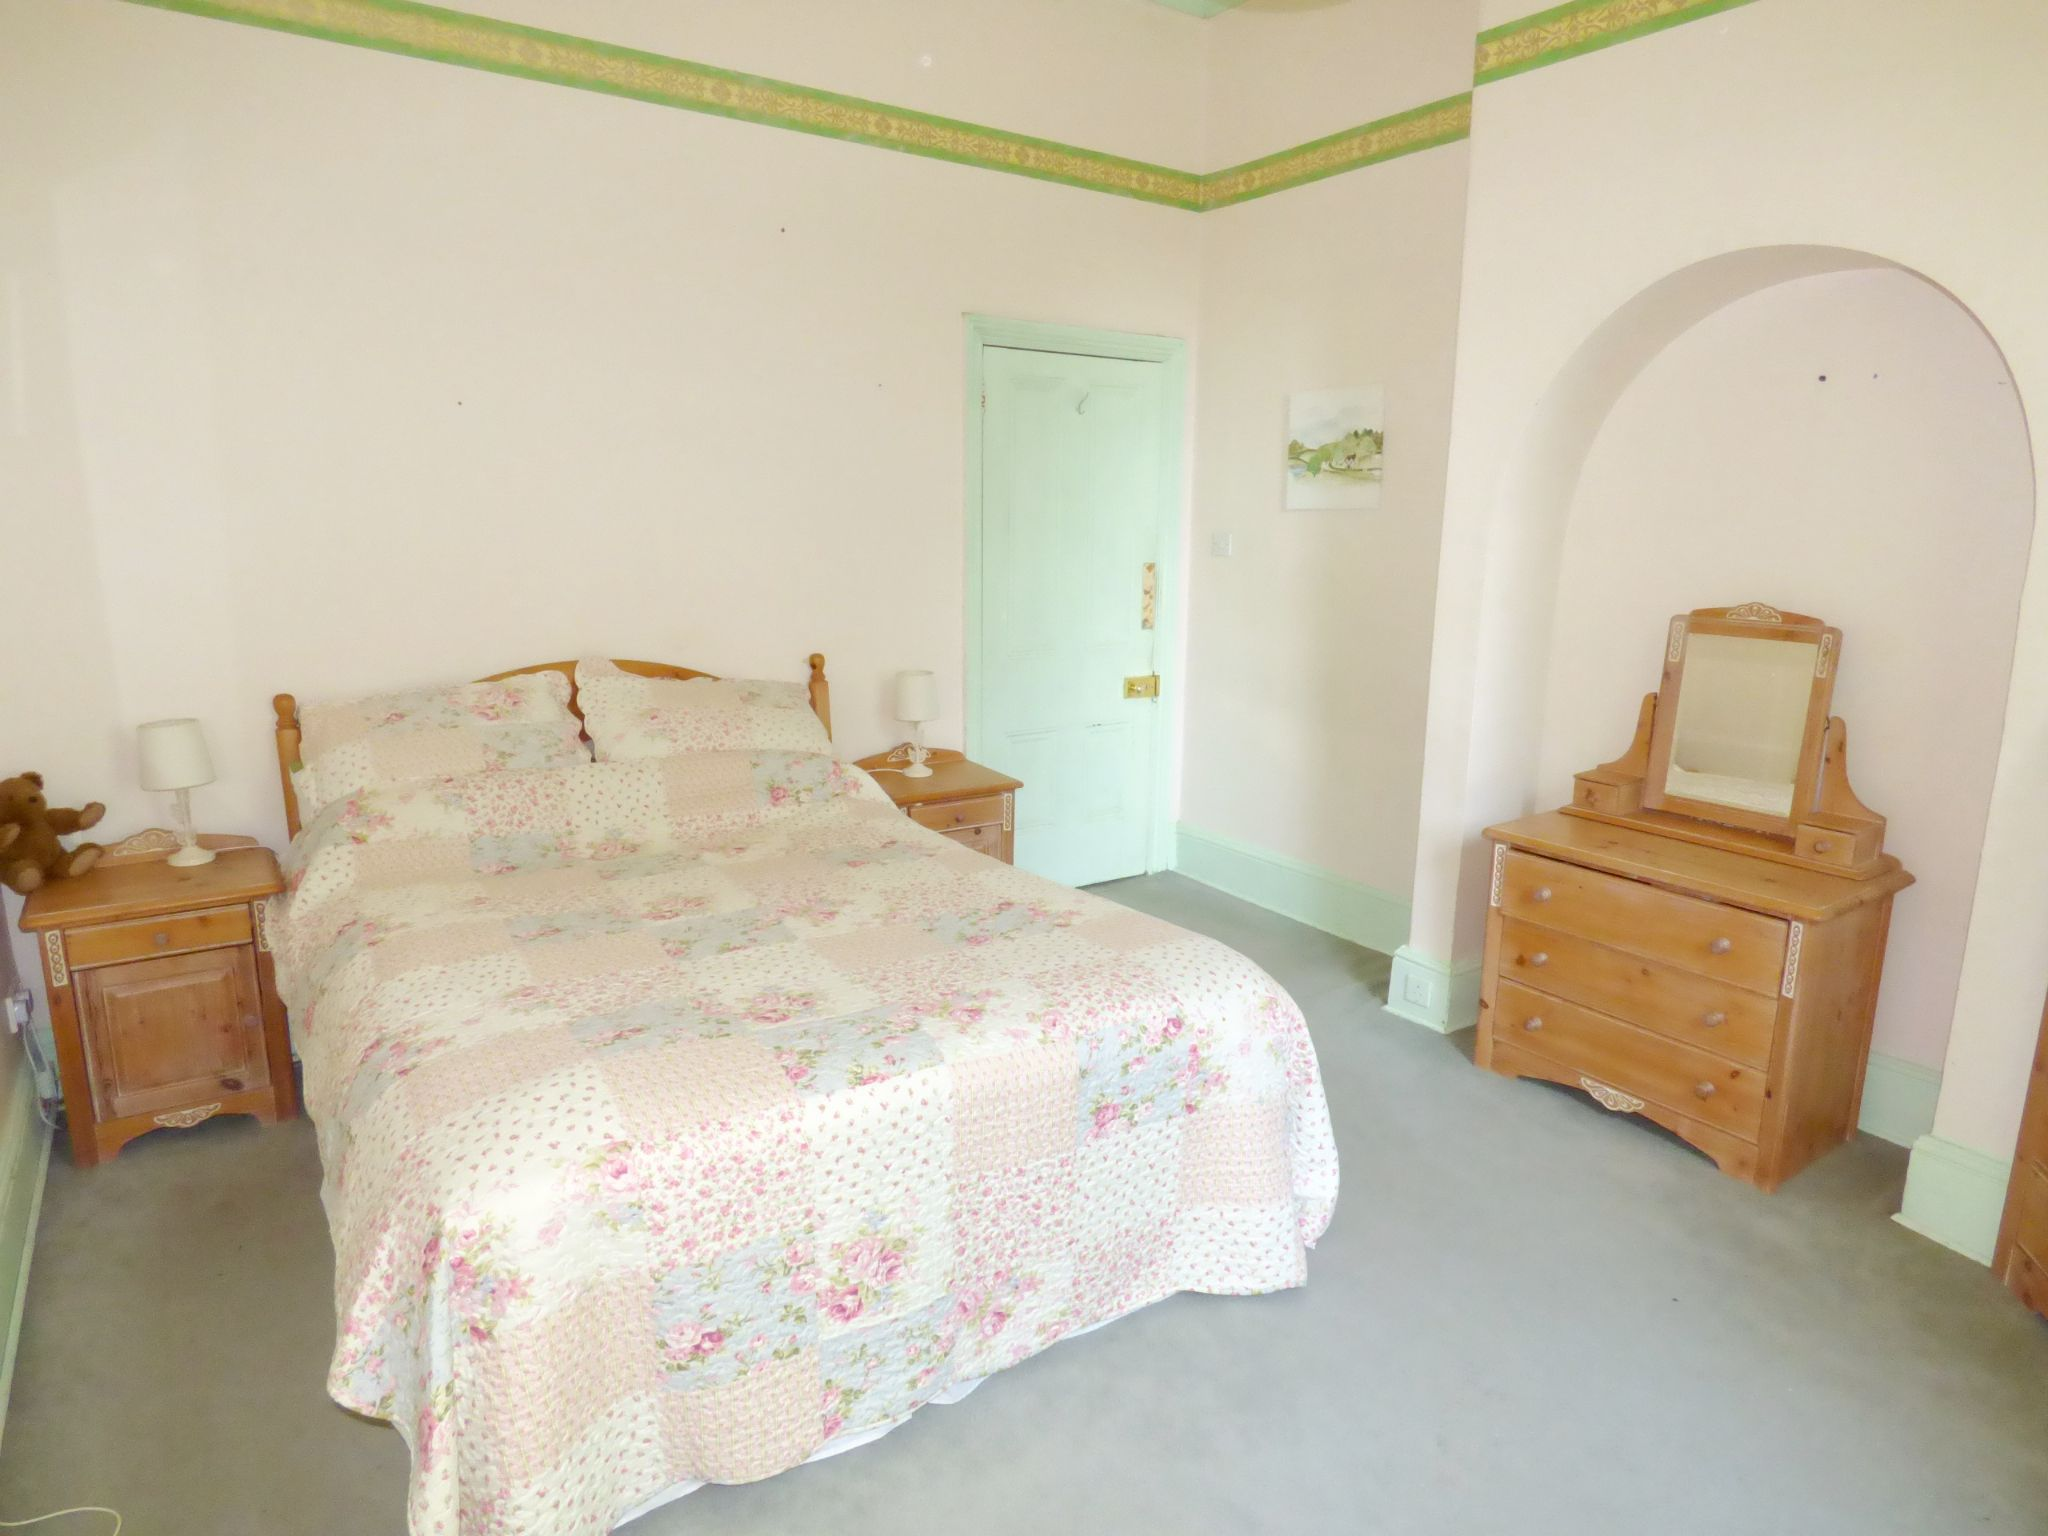 6 Bedroom Detached House For Sale - Bedroom One